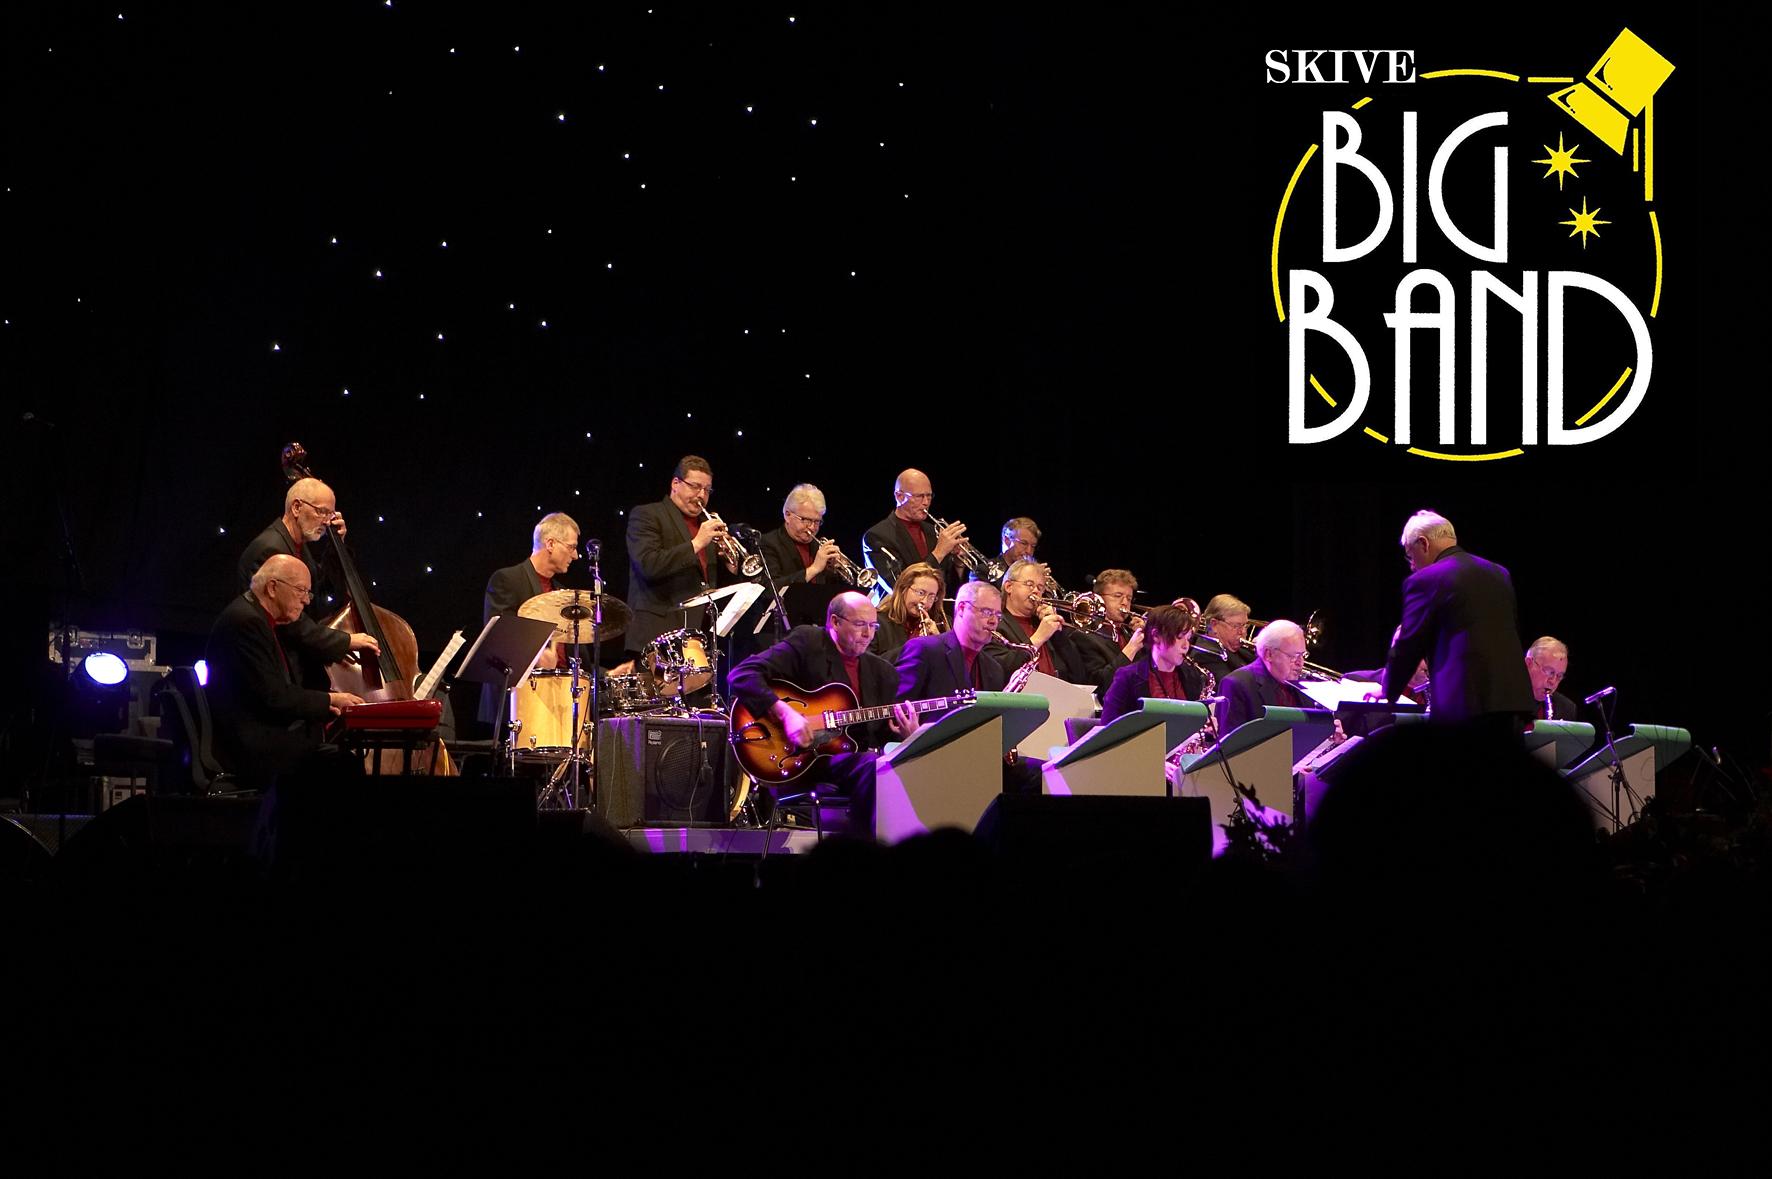 Skive Big Band